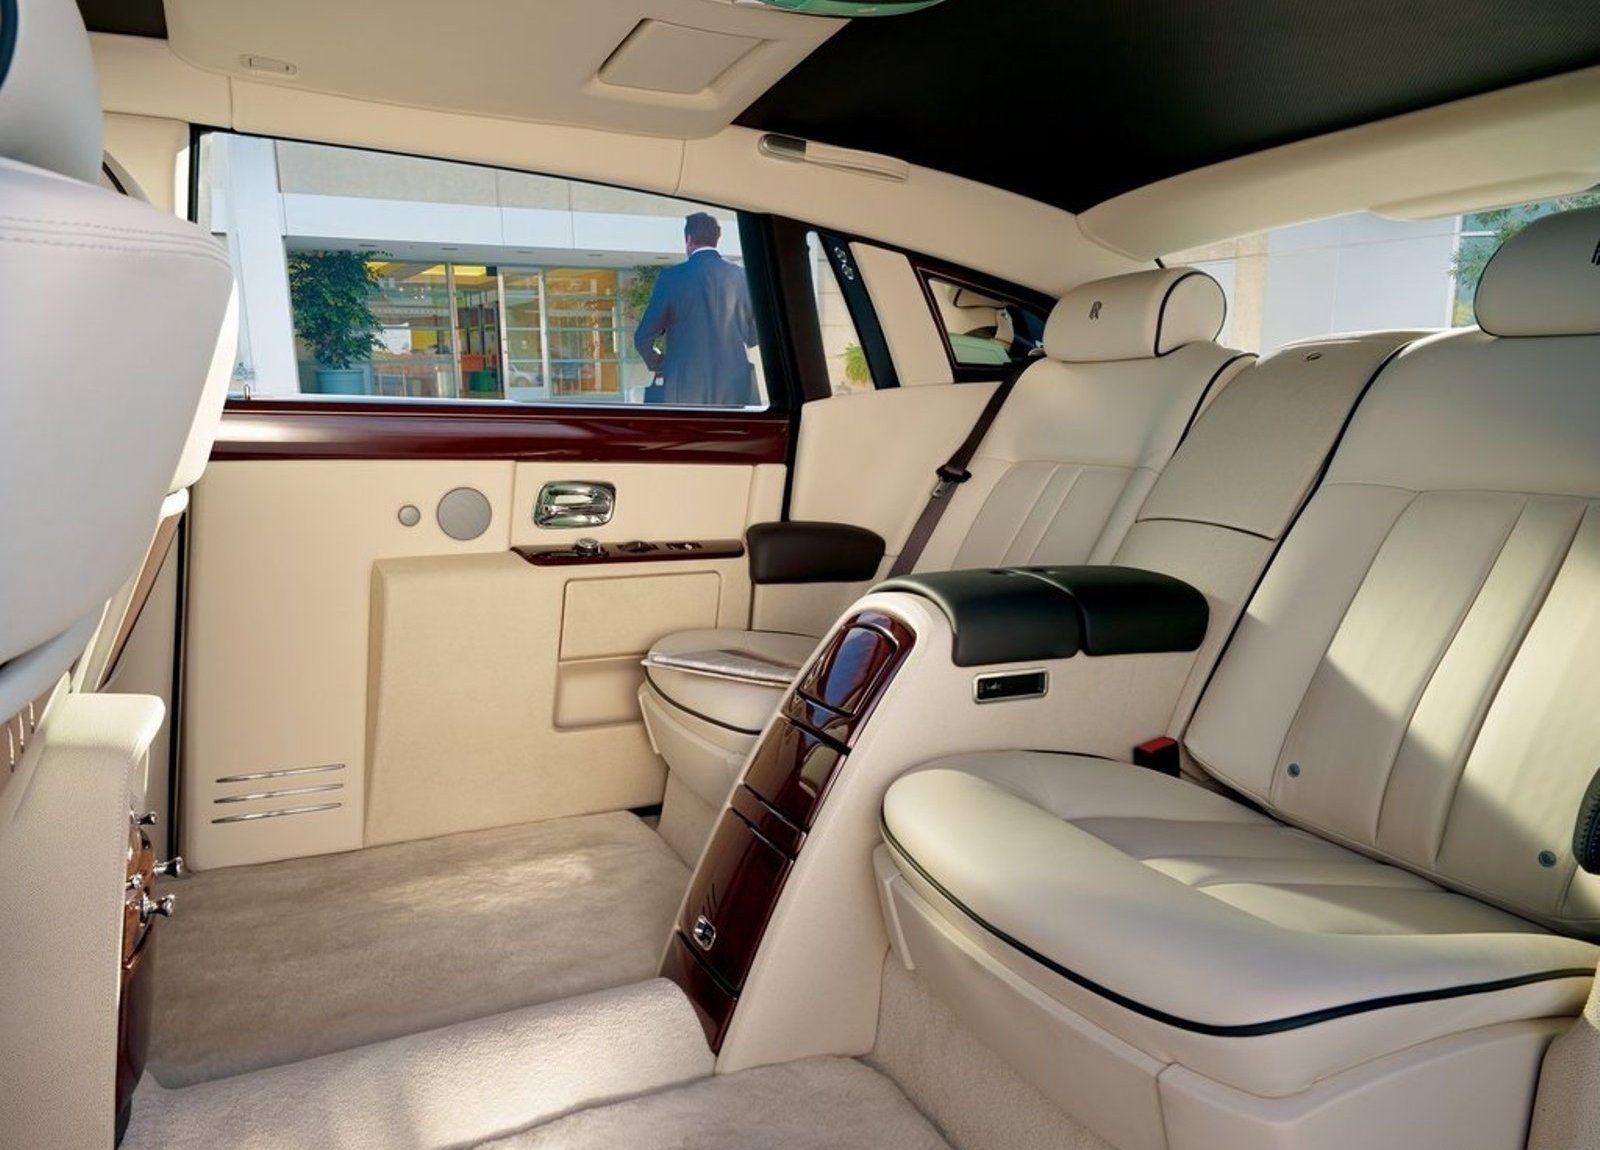 Rolls Royce Ghost 2015 Interior Hd Picture 31882 Rolls Royce